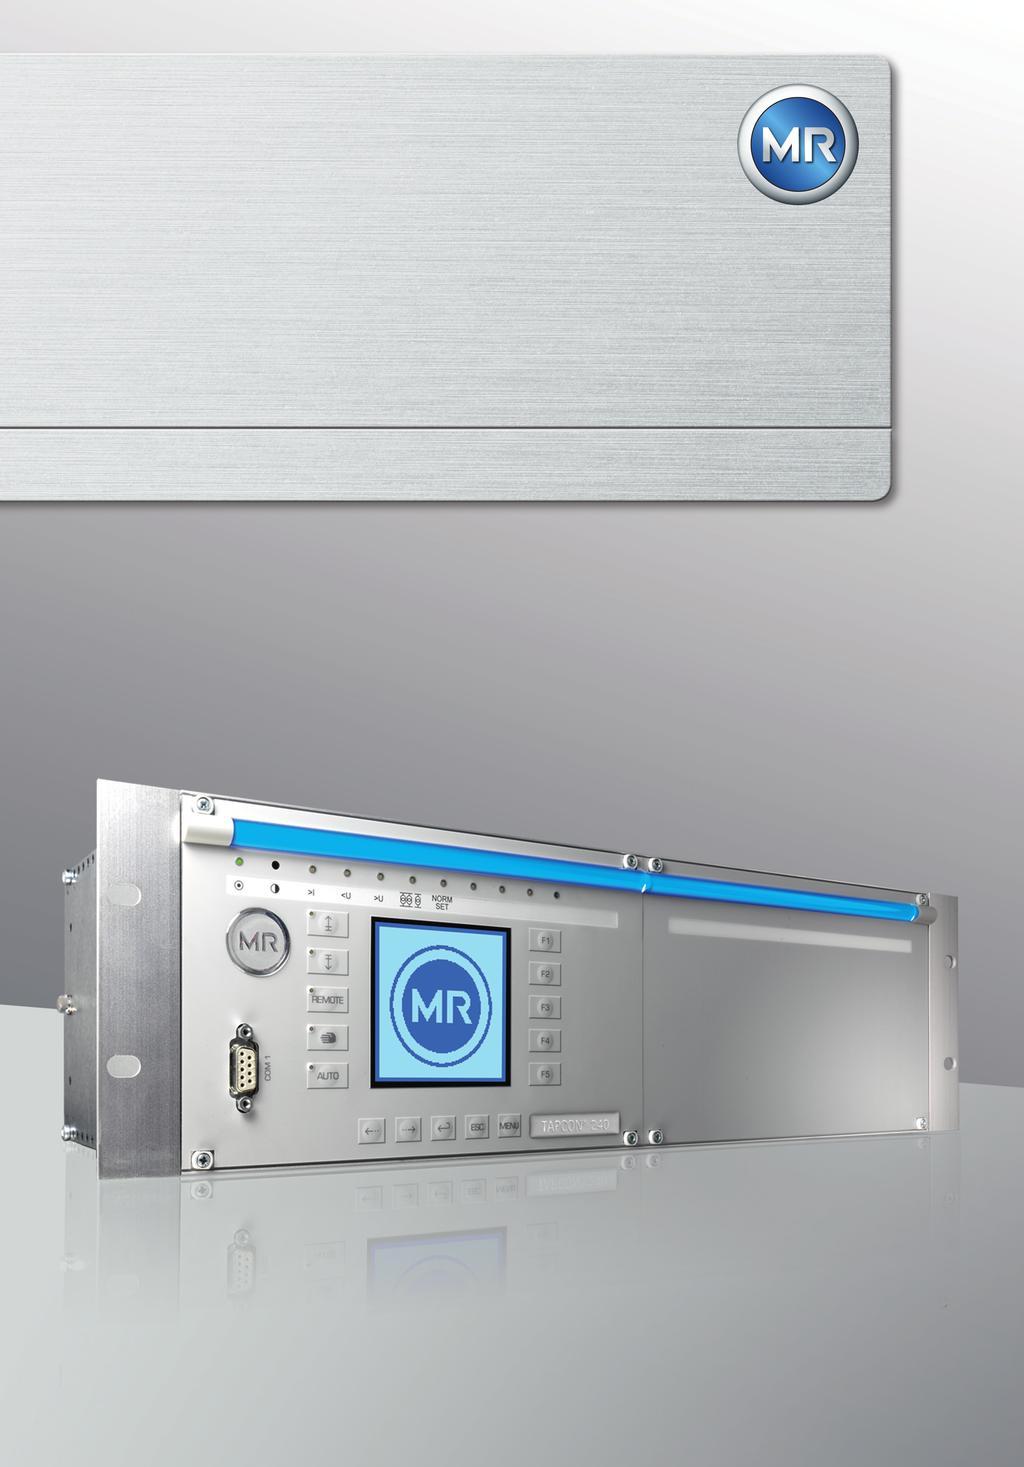 tapcon 240 wiring diagram 2009 pontiac g6 gt voltage regulator pdf